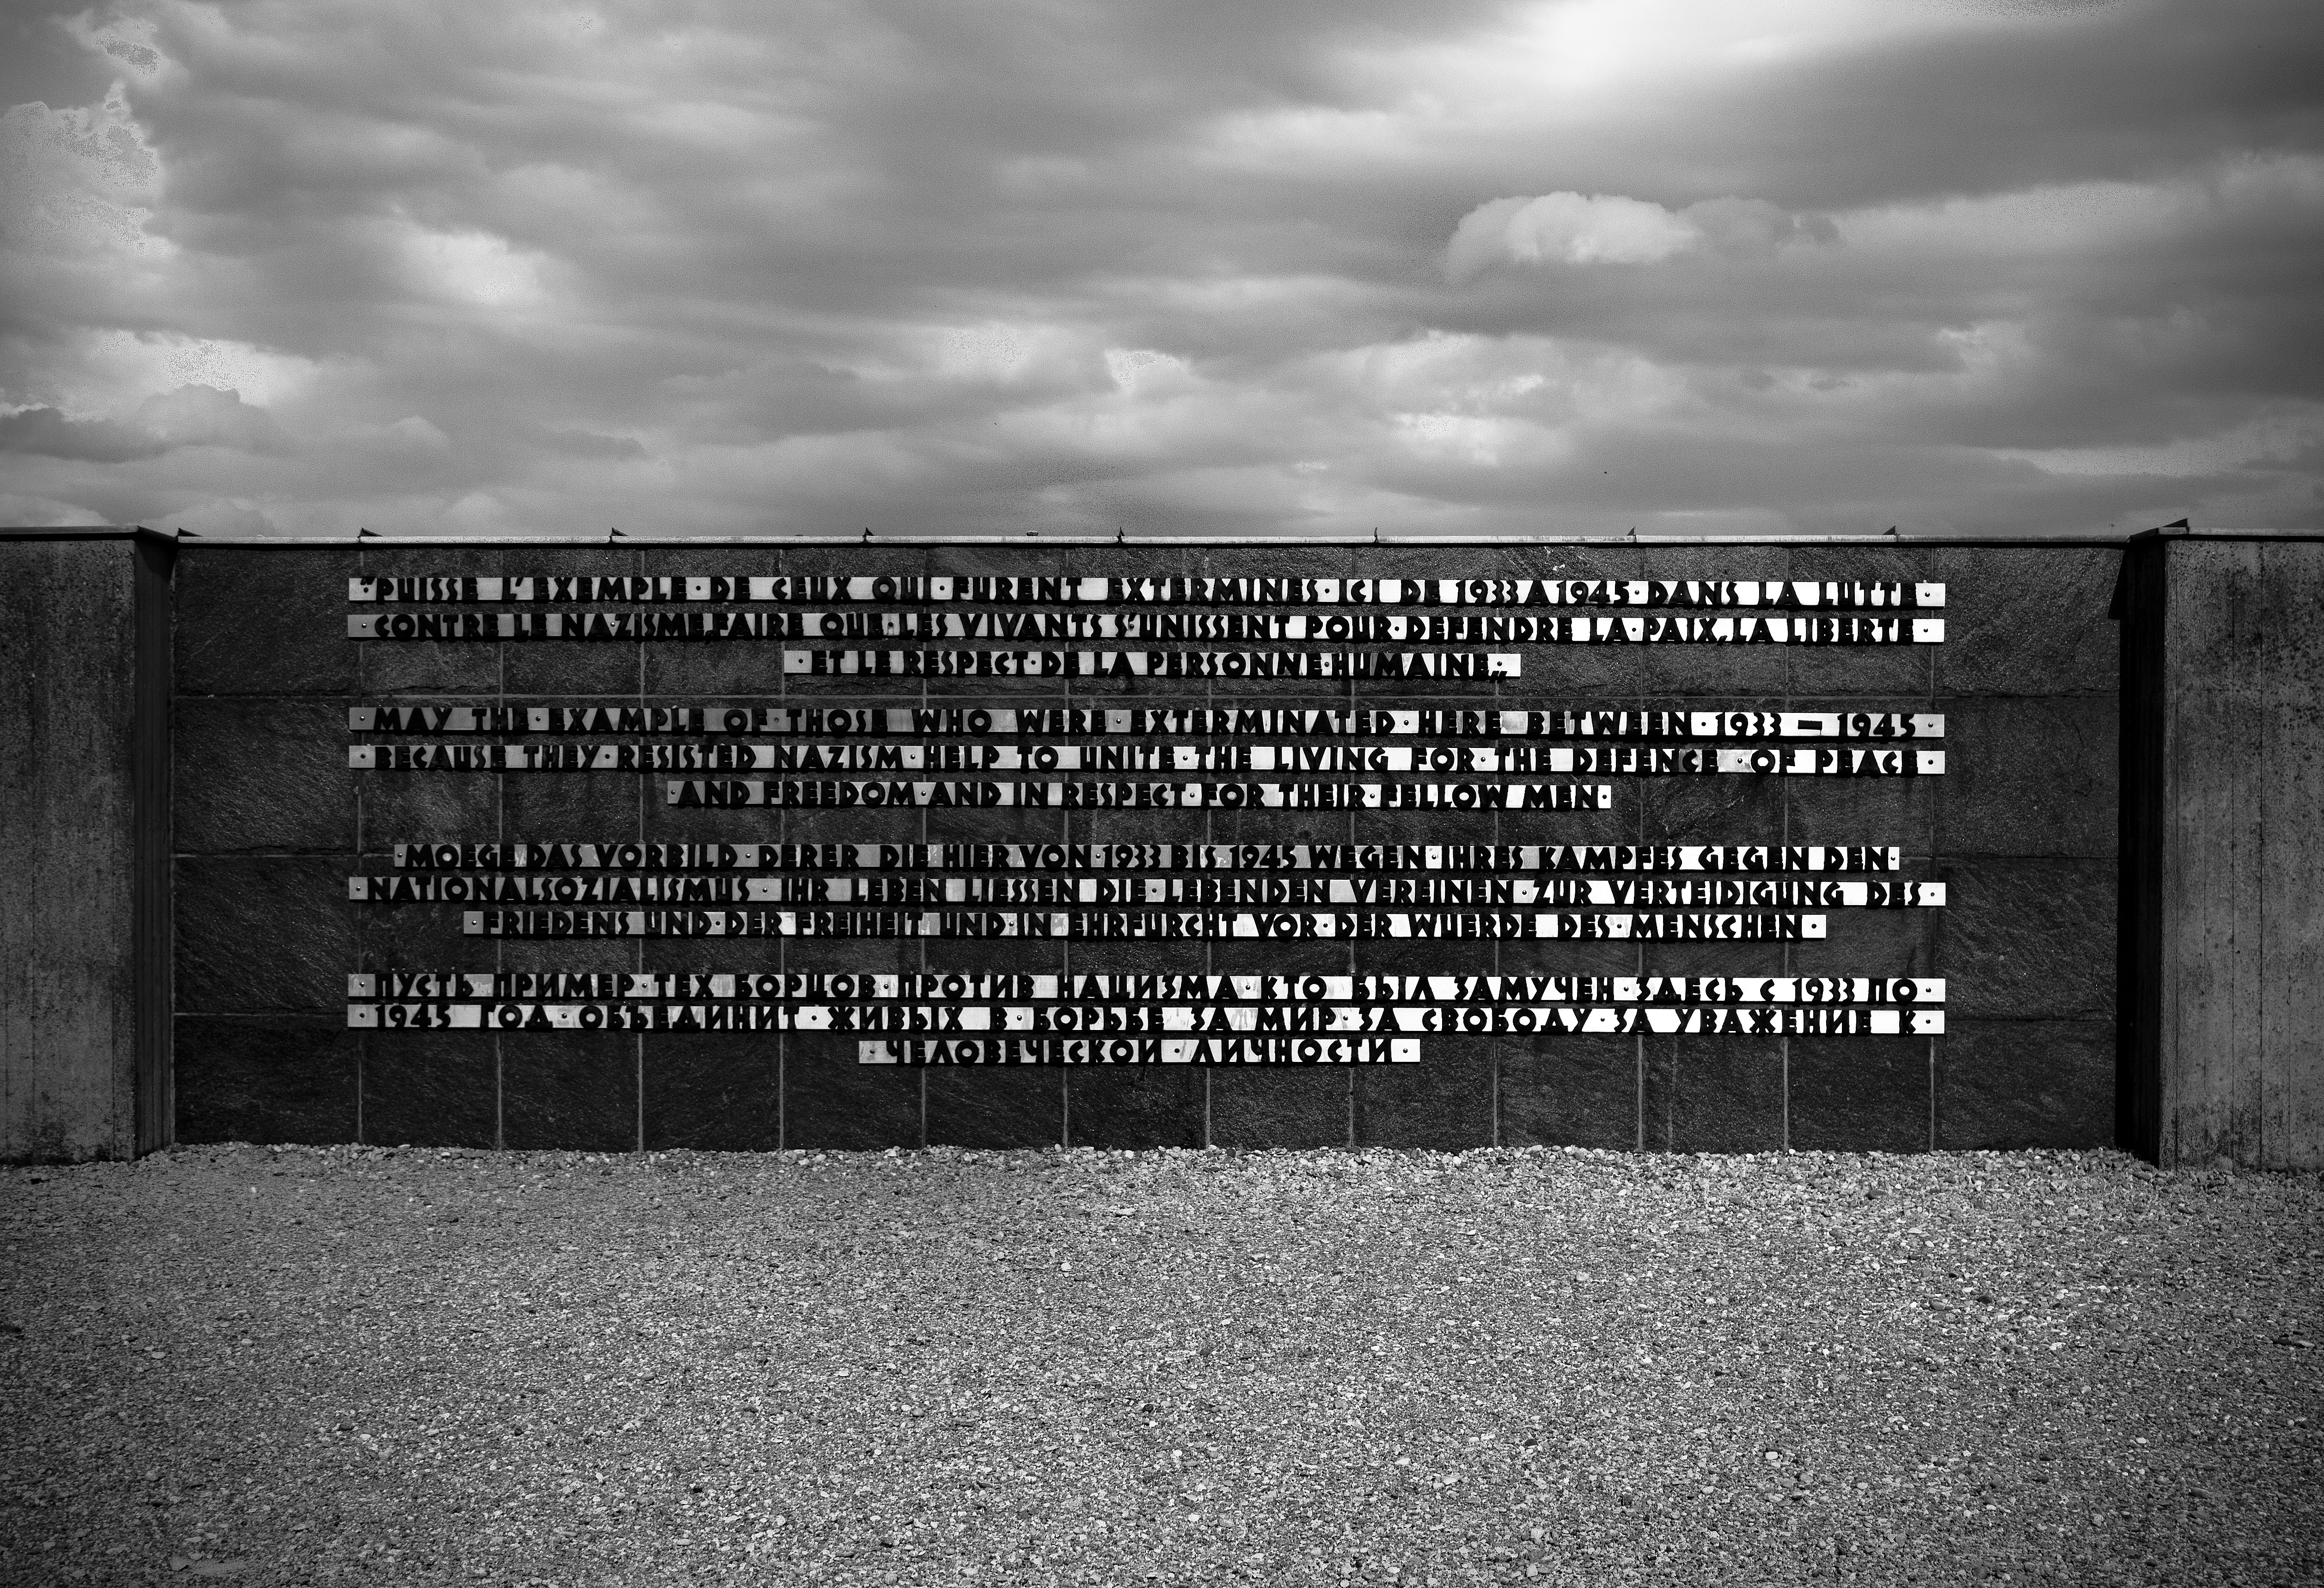 memoration writings Dachau